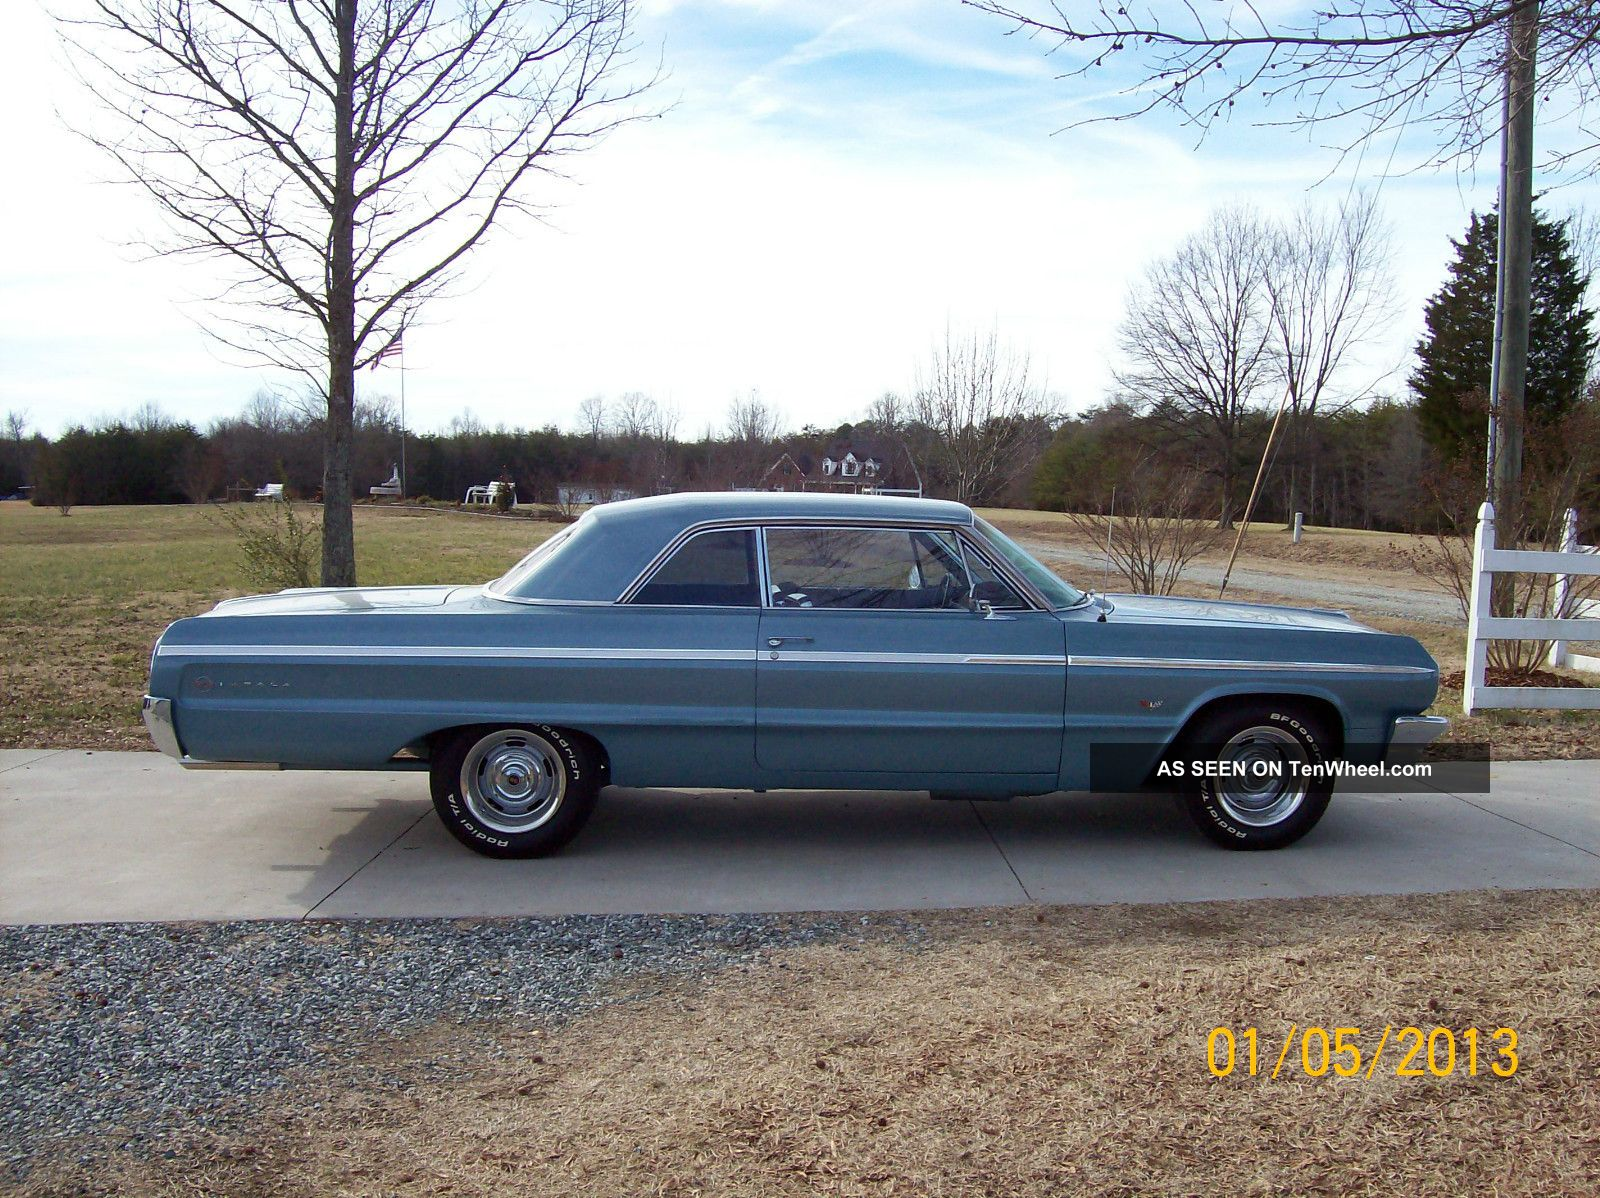 1964 chevrolet impala ss 5 4l. Black Bedroom Furniture Sets. Home Design Ideas